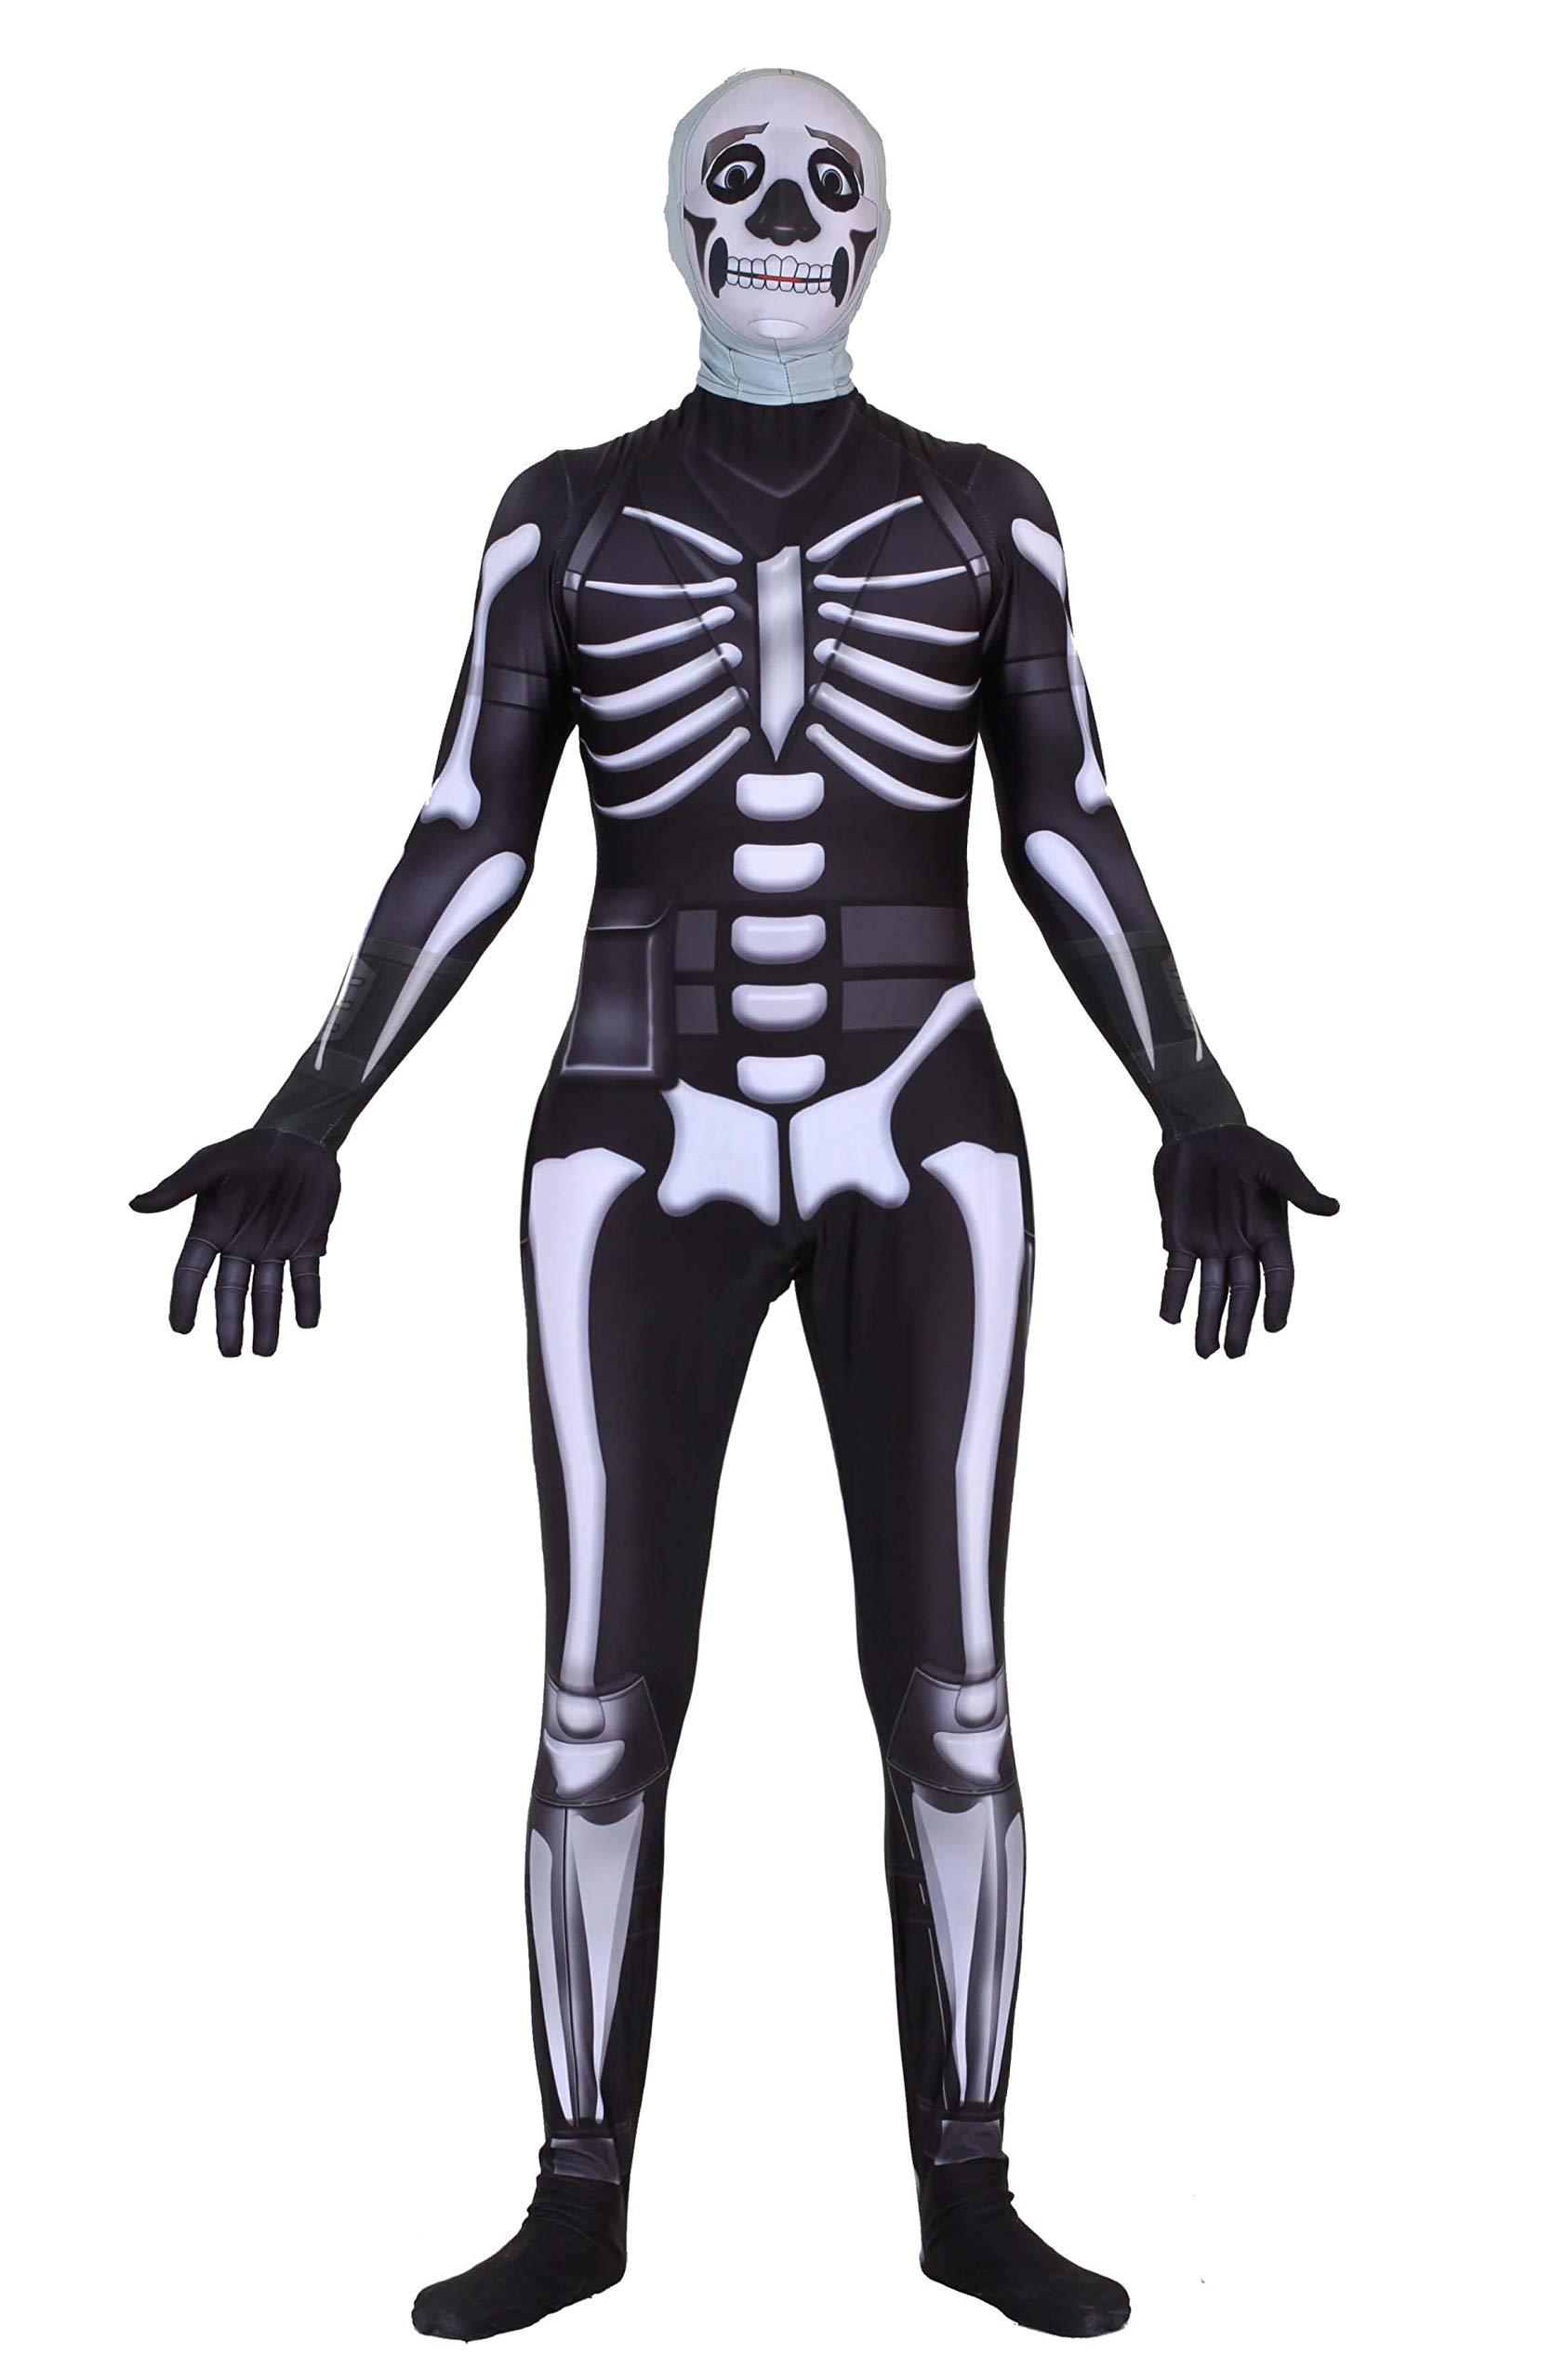 Riekinc Halloween Spandex Zentai Cosplay Costume Skull Trooper Costume  Adult/Kids - Harold Wilkinson's Place